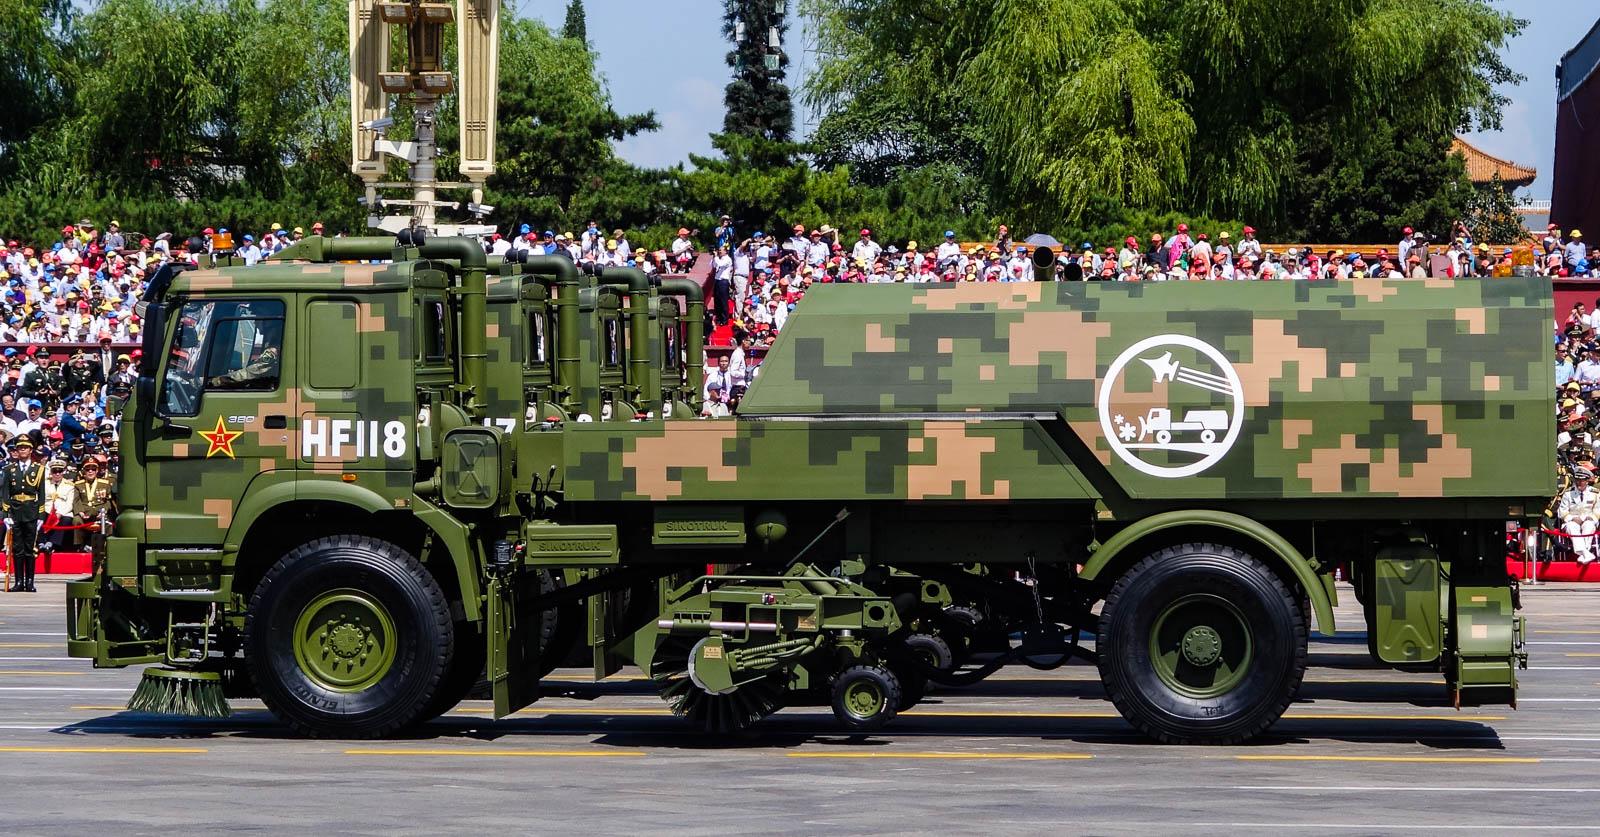 beijing-china-military-parade-2015-40